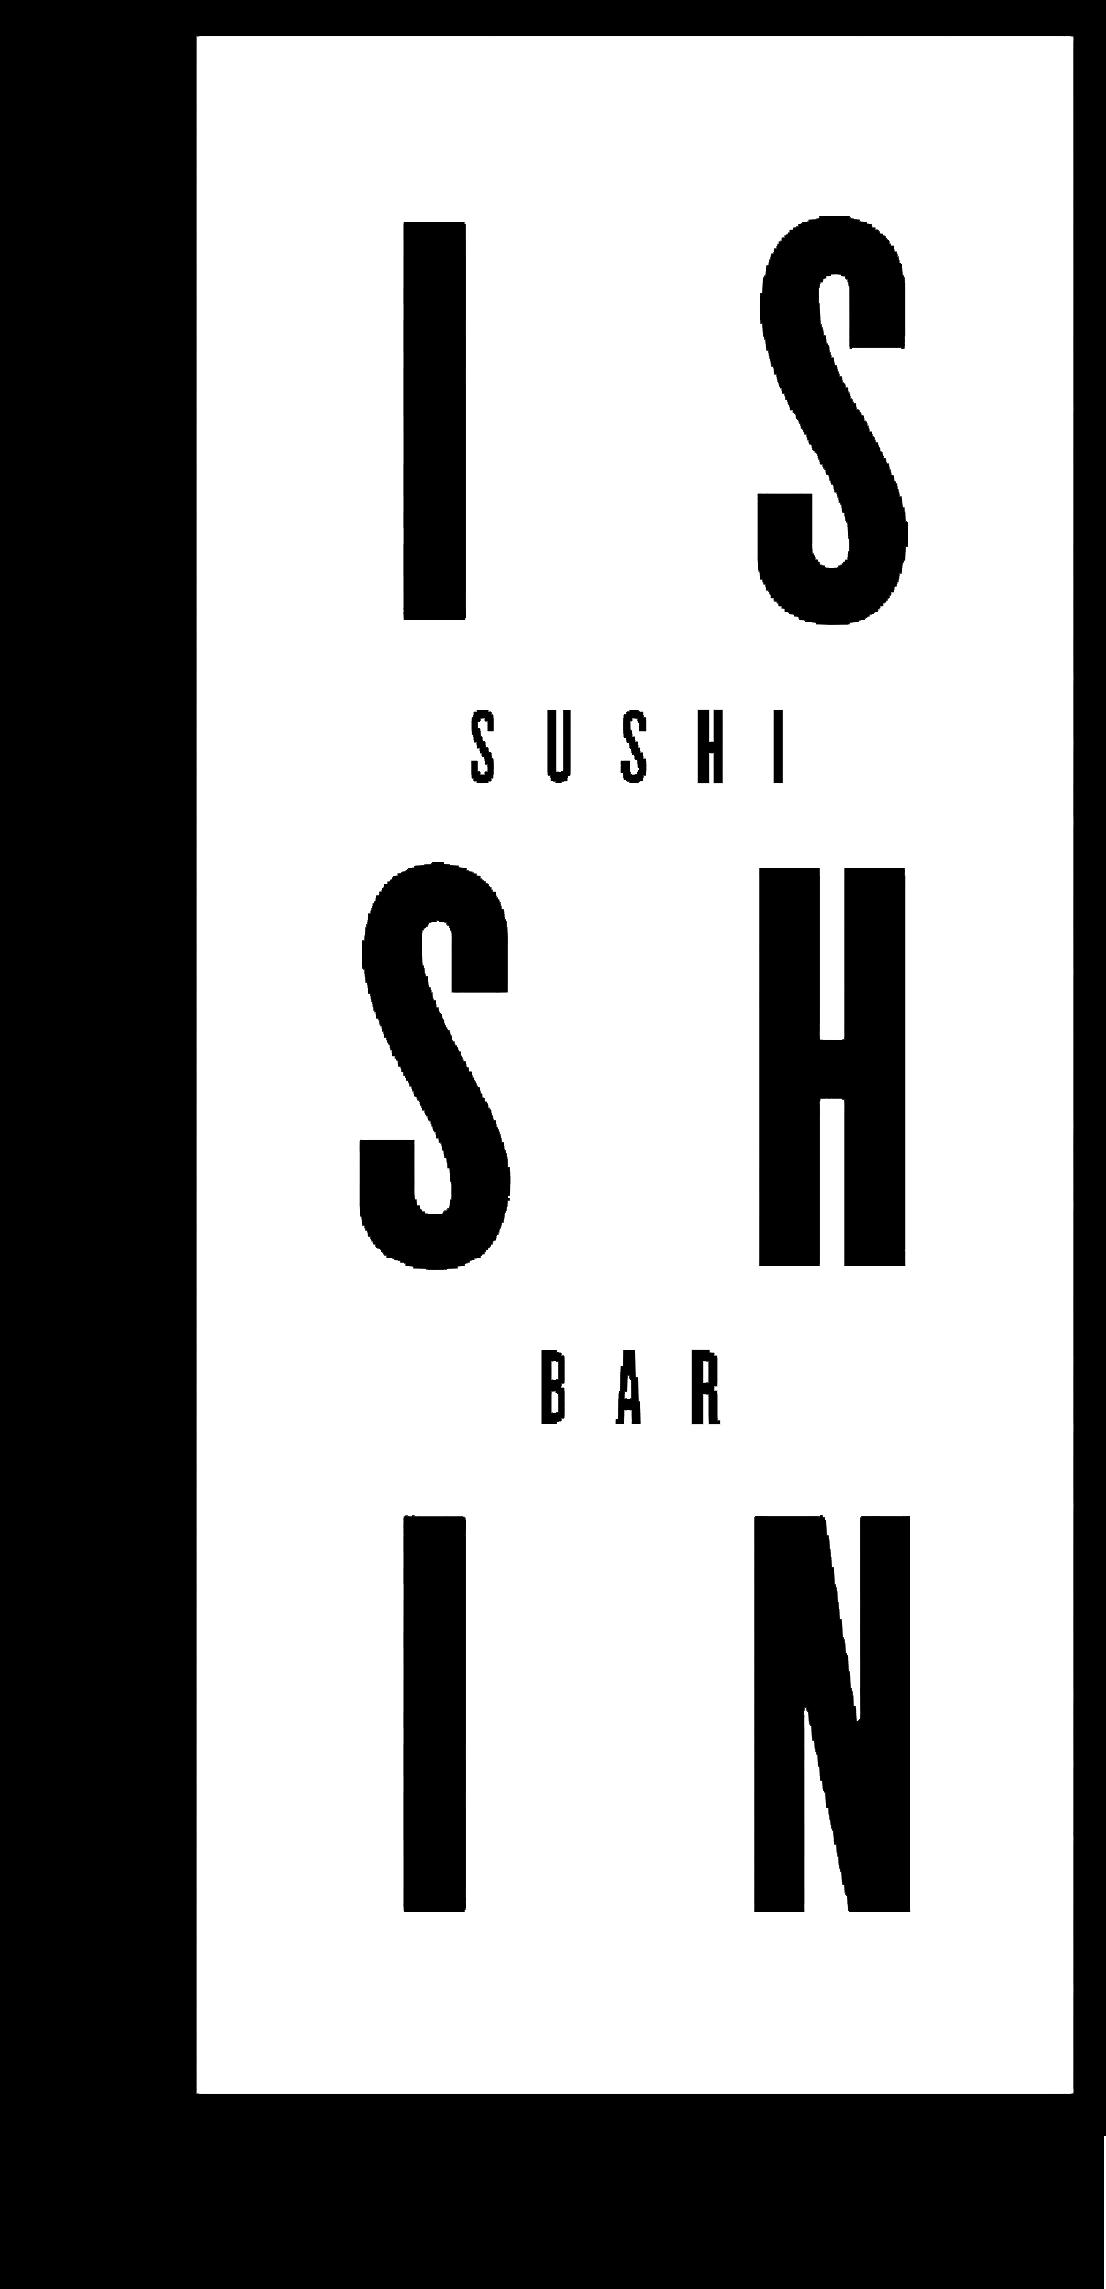 Isshin Sushi